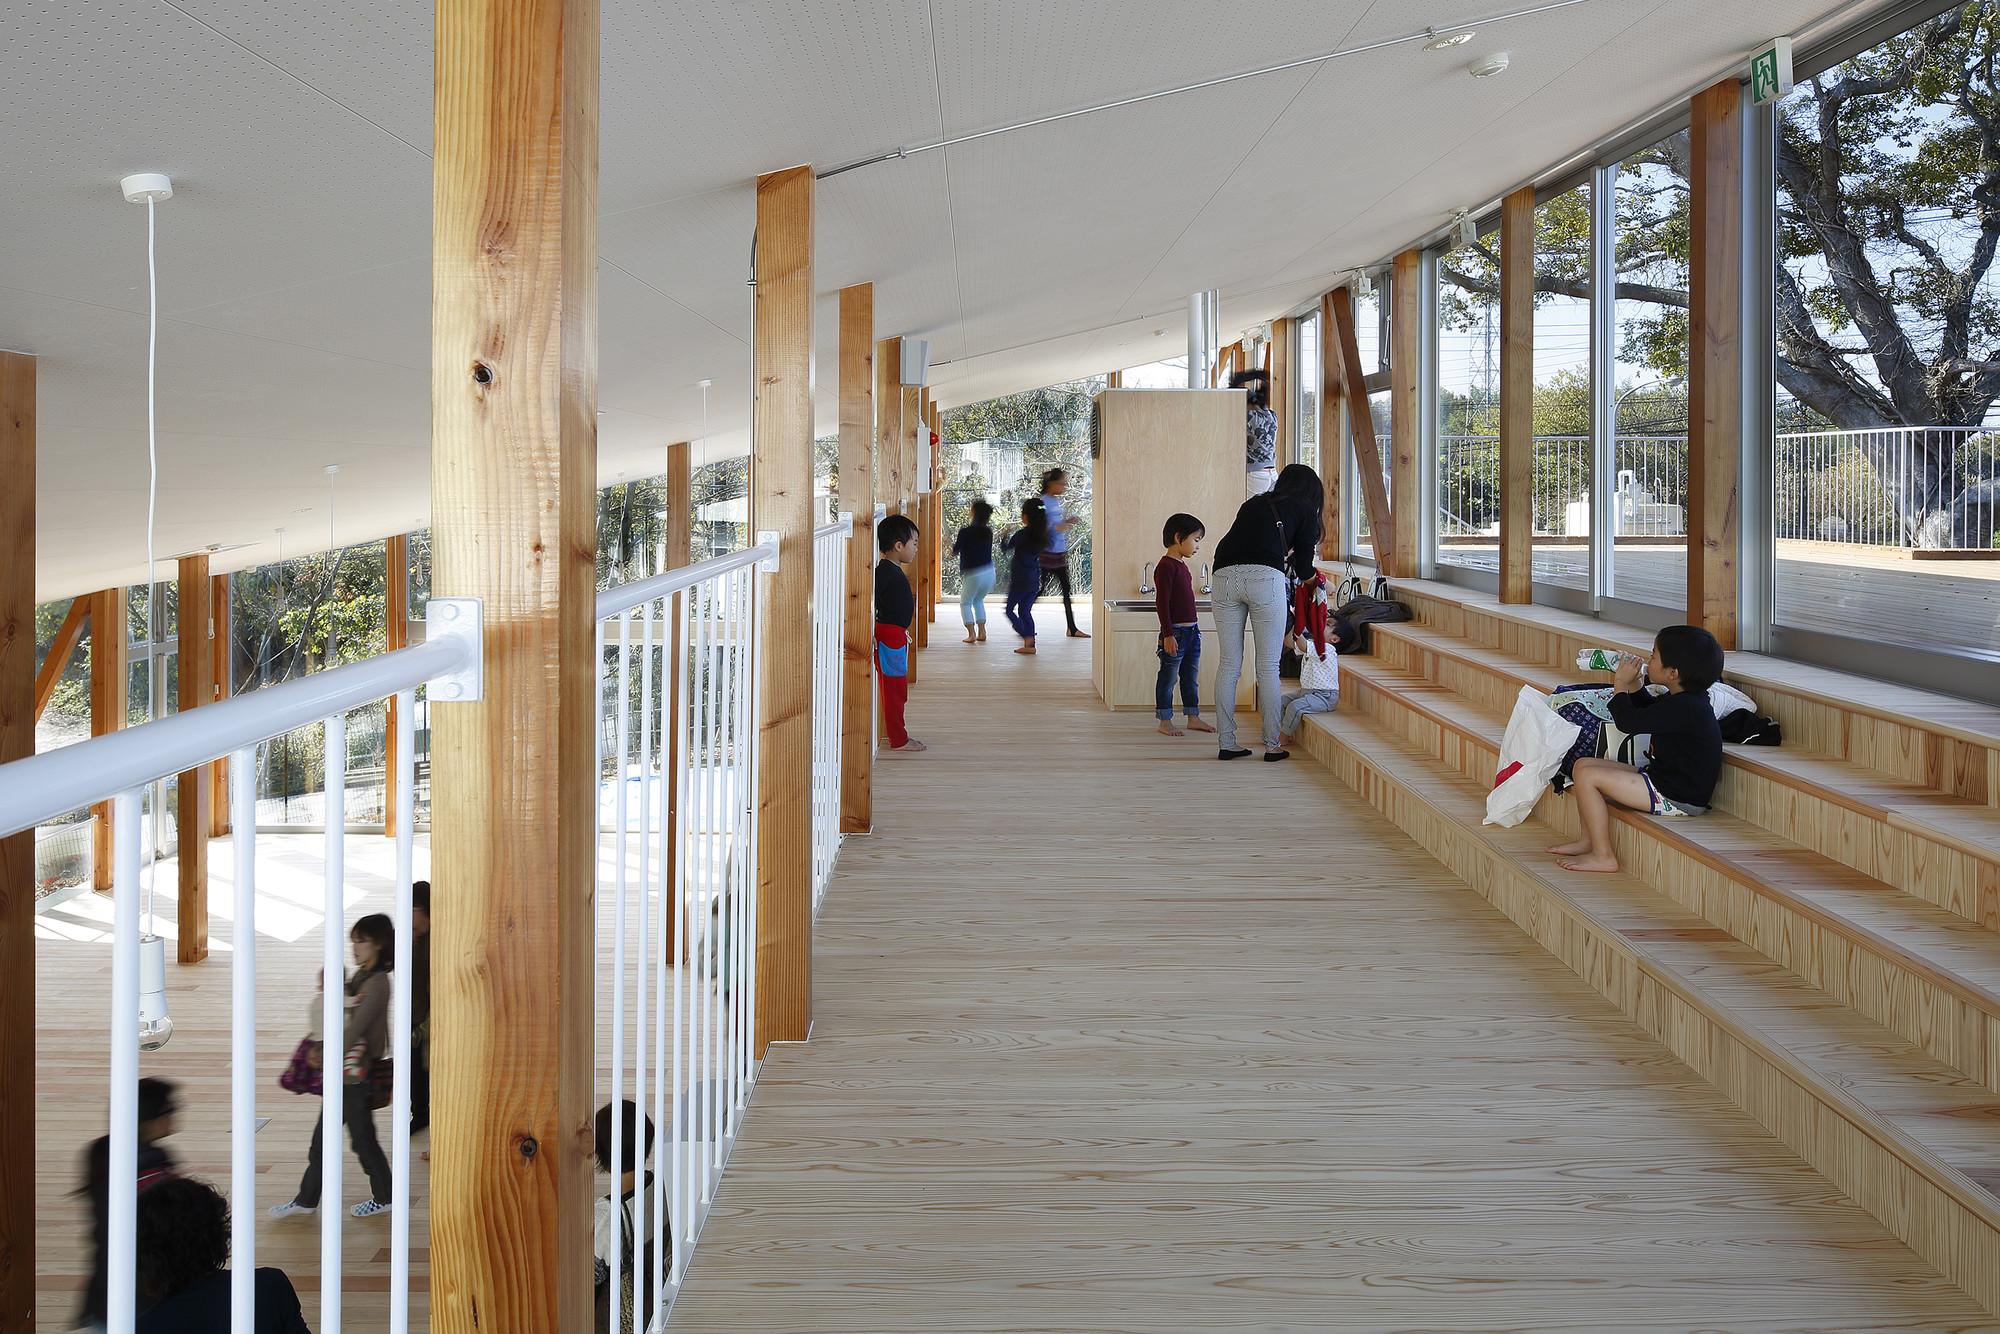 Architecture Design Workshop gallery of hakusui nursery school / yamazaki kentaro design